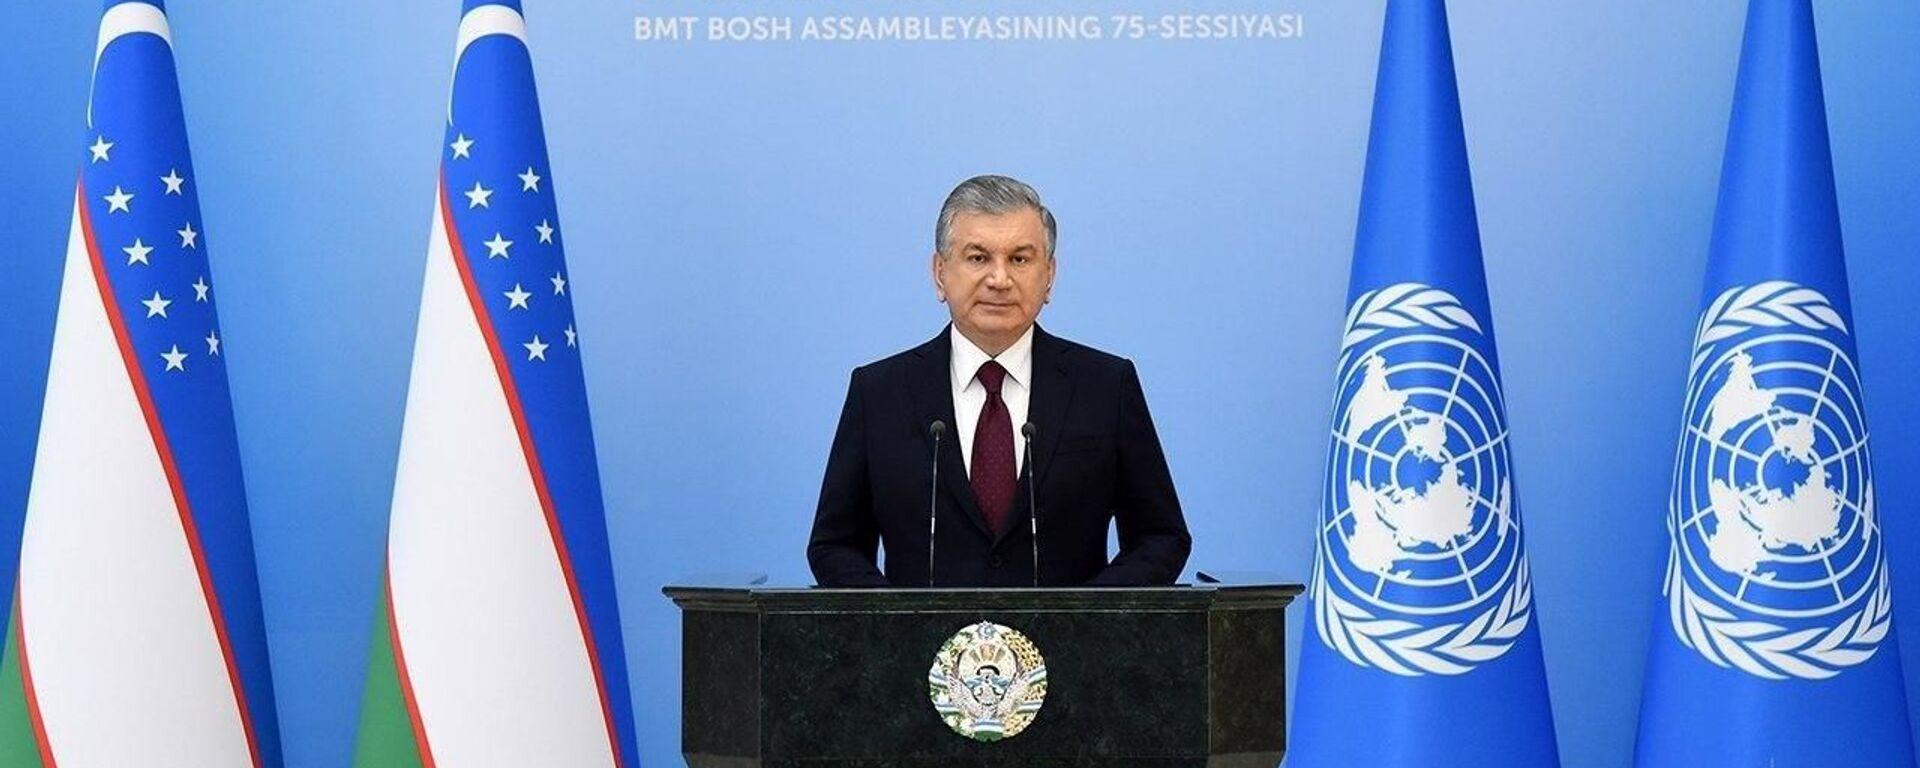 Выступление президента Узбекистана Шавката Мирзиёева на 75-й сессии Генассамблеи ООН - Sputnik Узбекистан, 1920, 23.09.2020